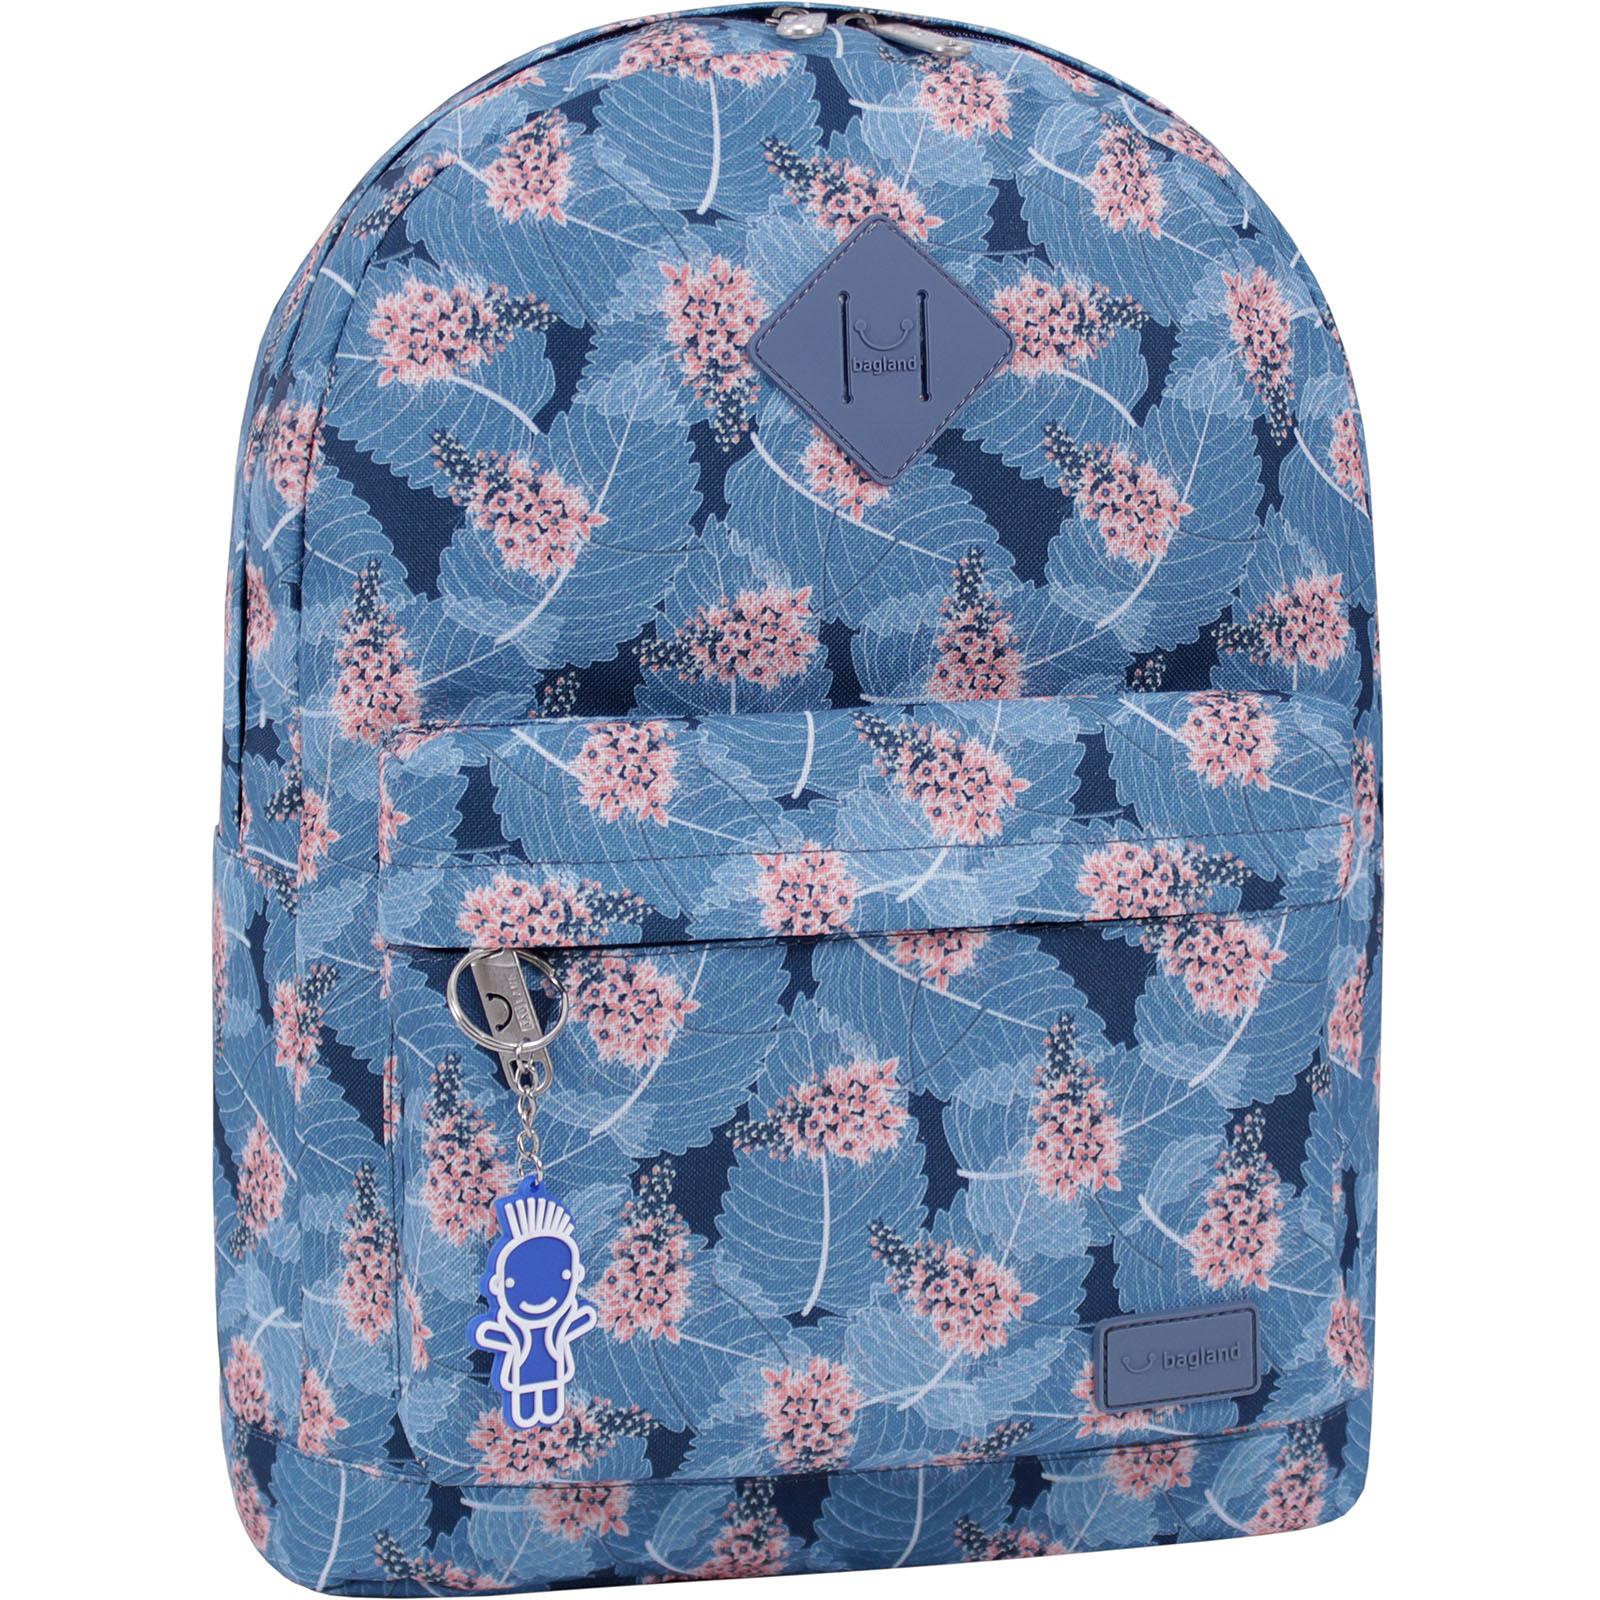 Молодежные рюкзаки Рюкзак Bagland Молодежный 17 л. сублимация 479 (00533664) IMG_9473_суб.479_.JPG